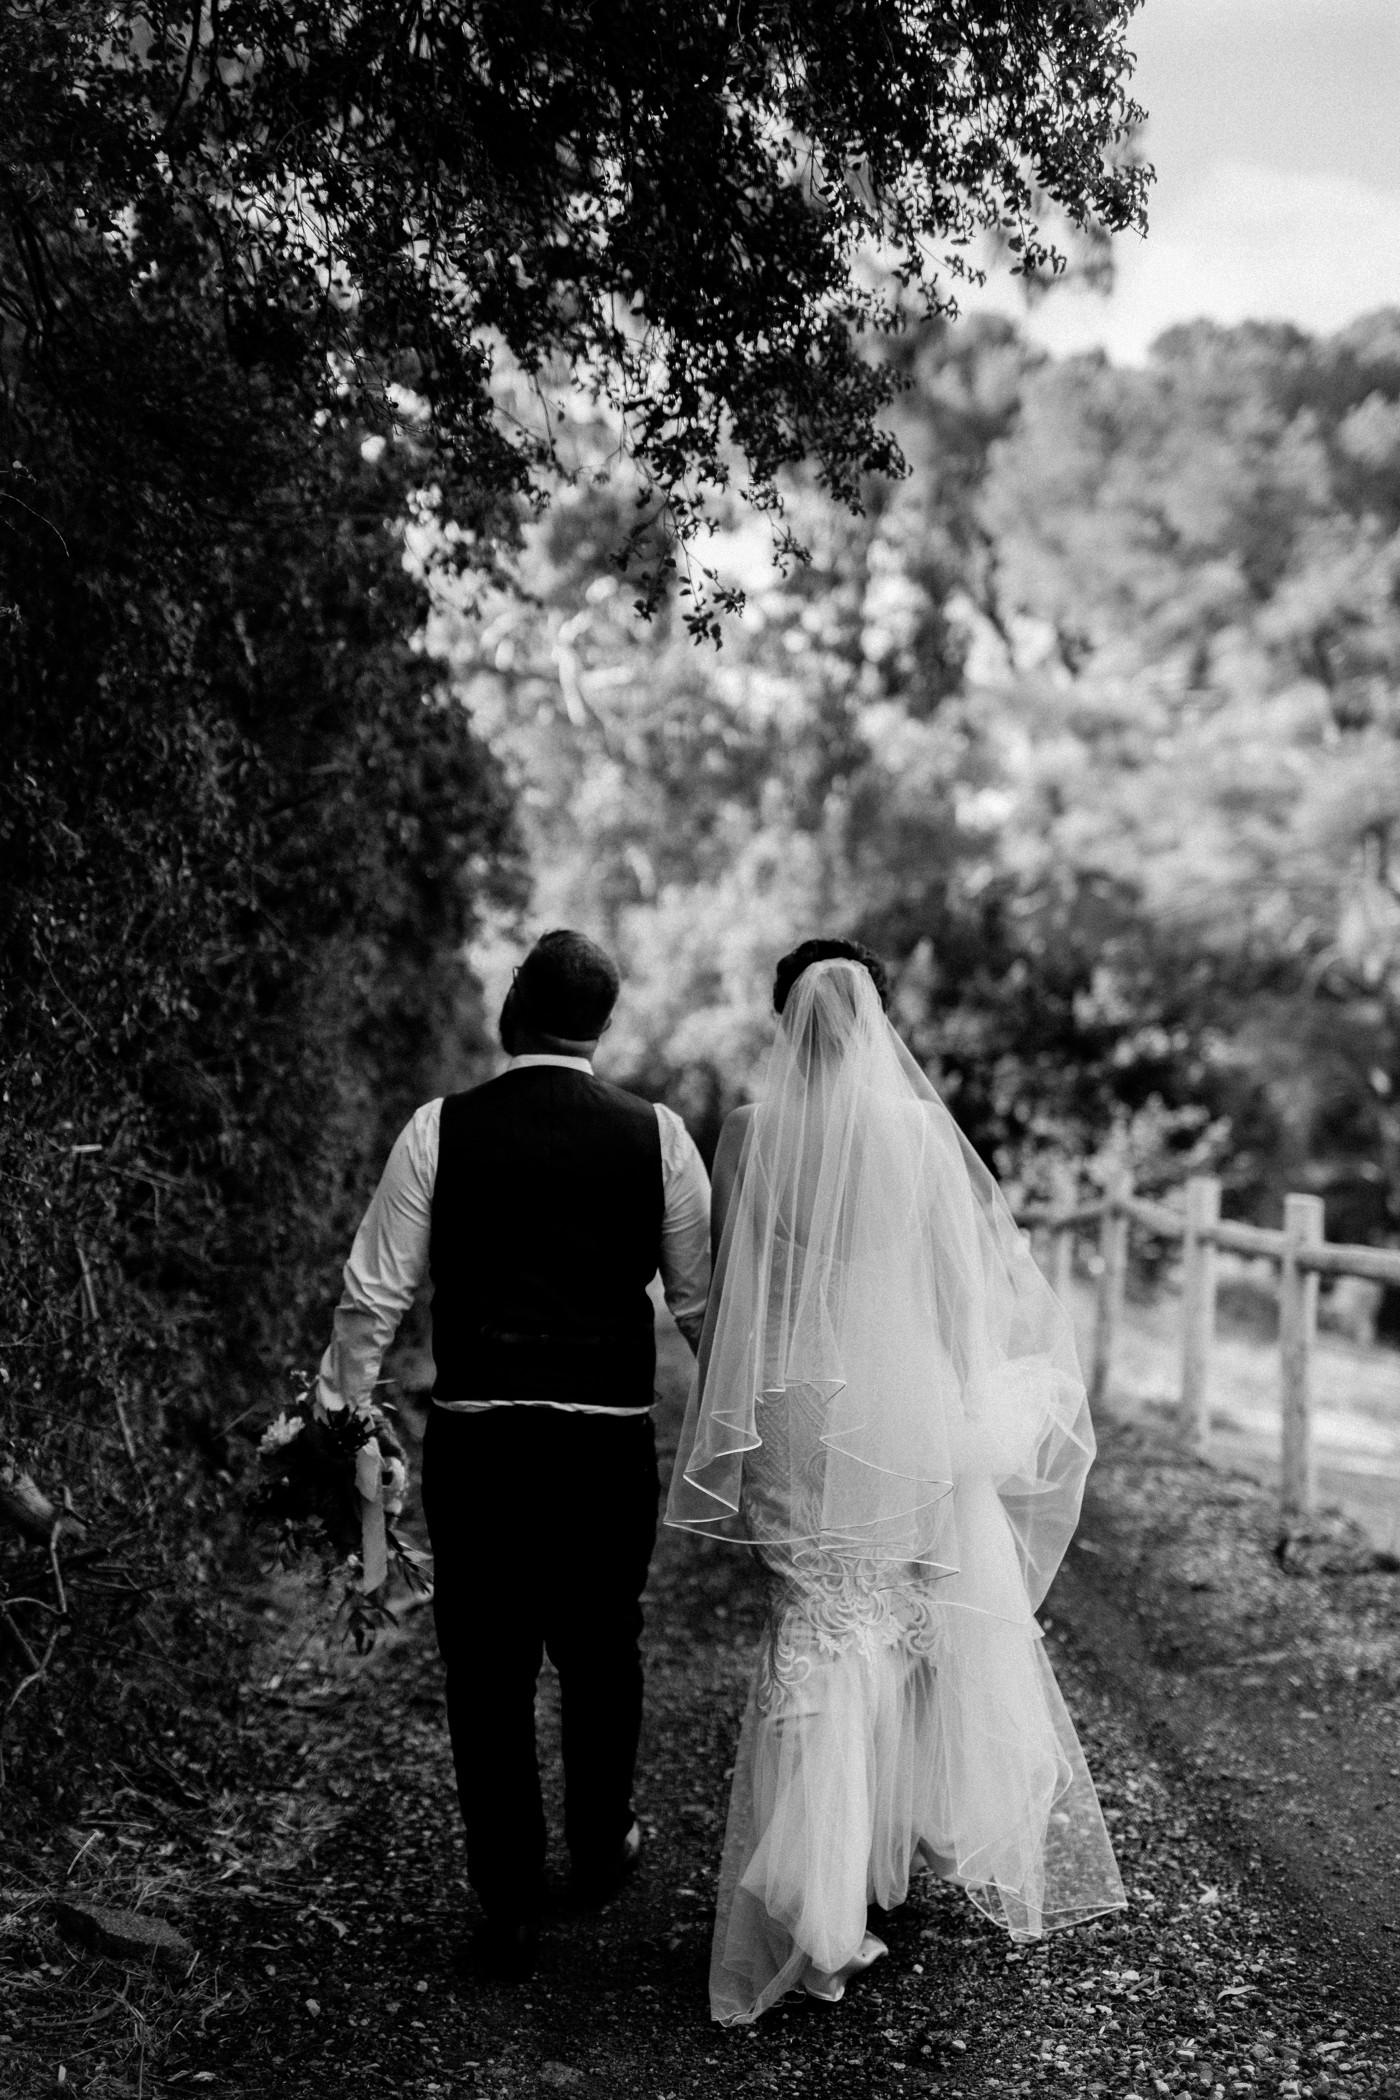 Emma & Aaron - Marybank Estate Wedding - Natural Wedding Photography in Adelaide - www.katherineschultzphotography.com_0055.jpg